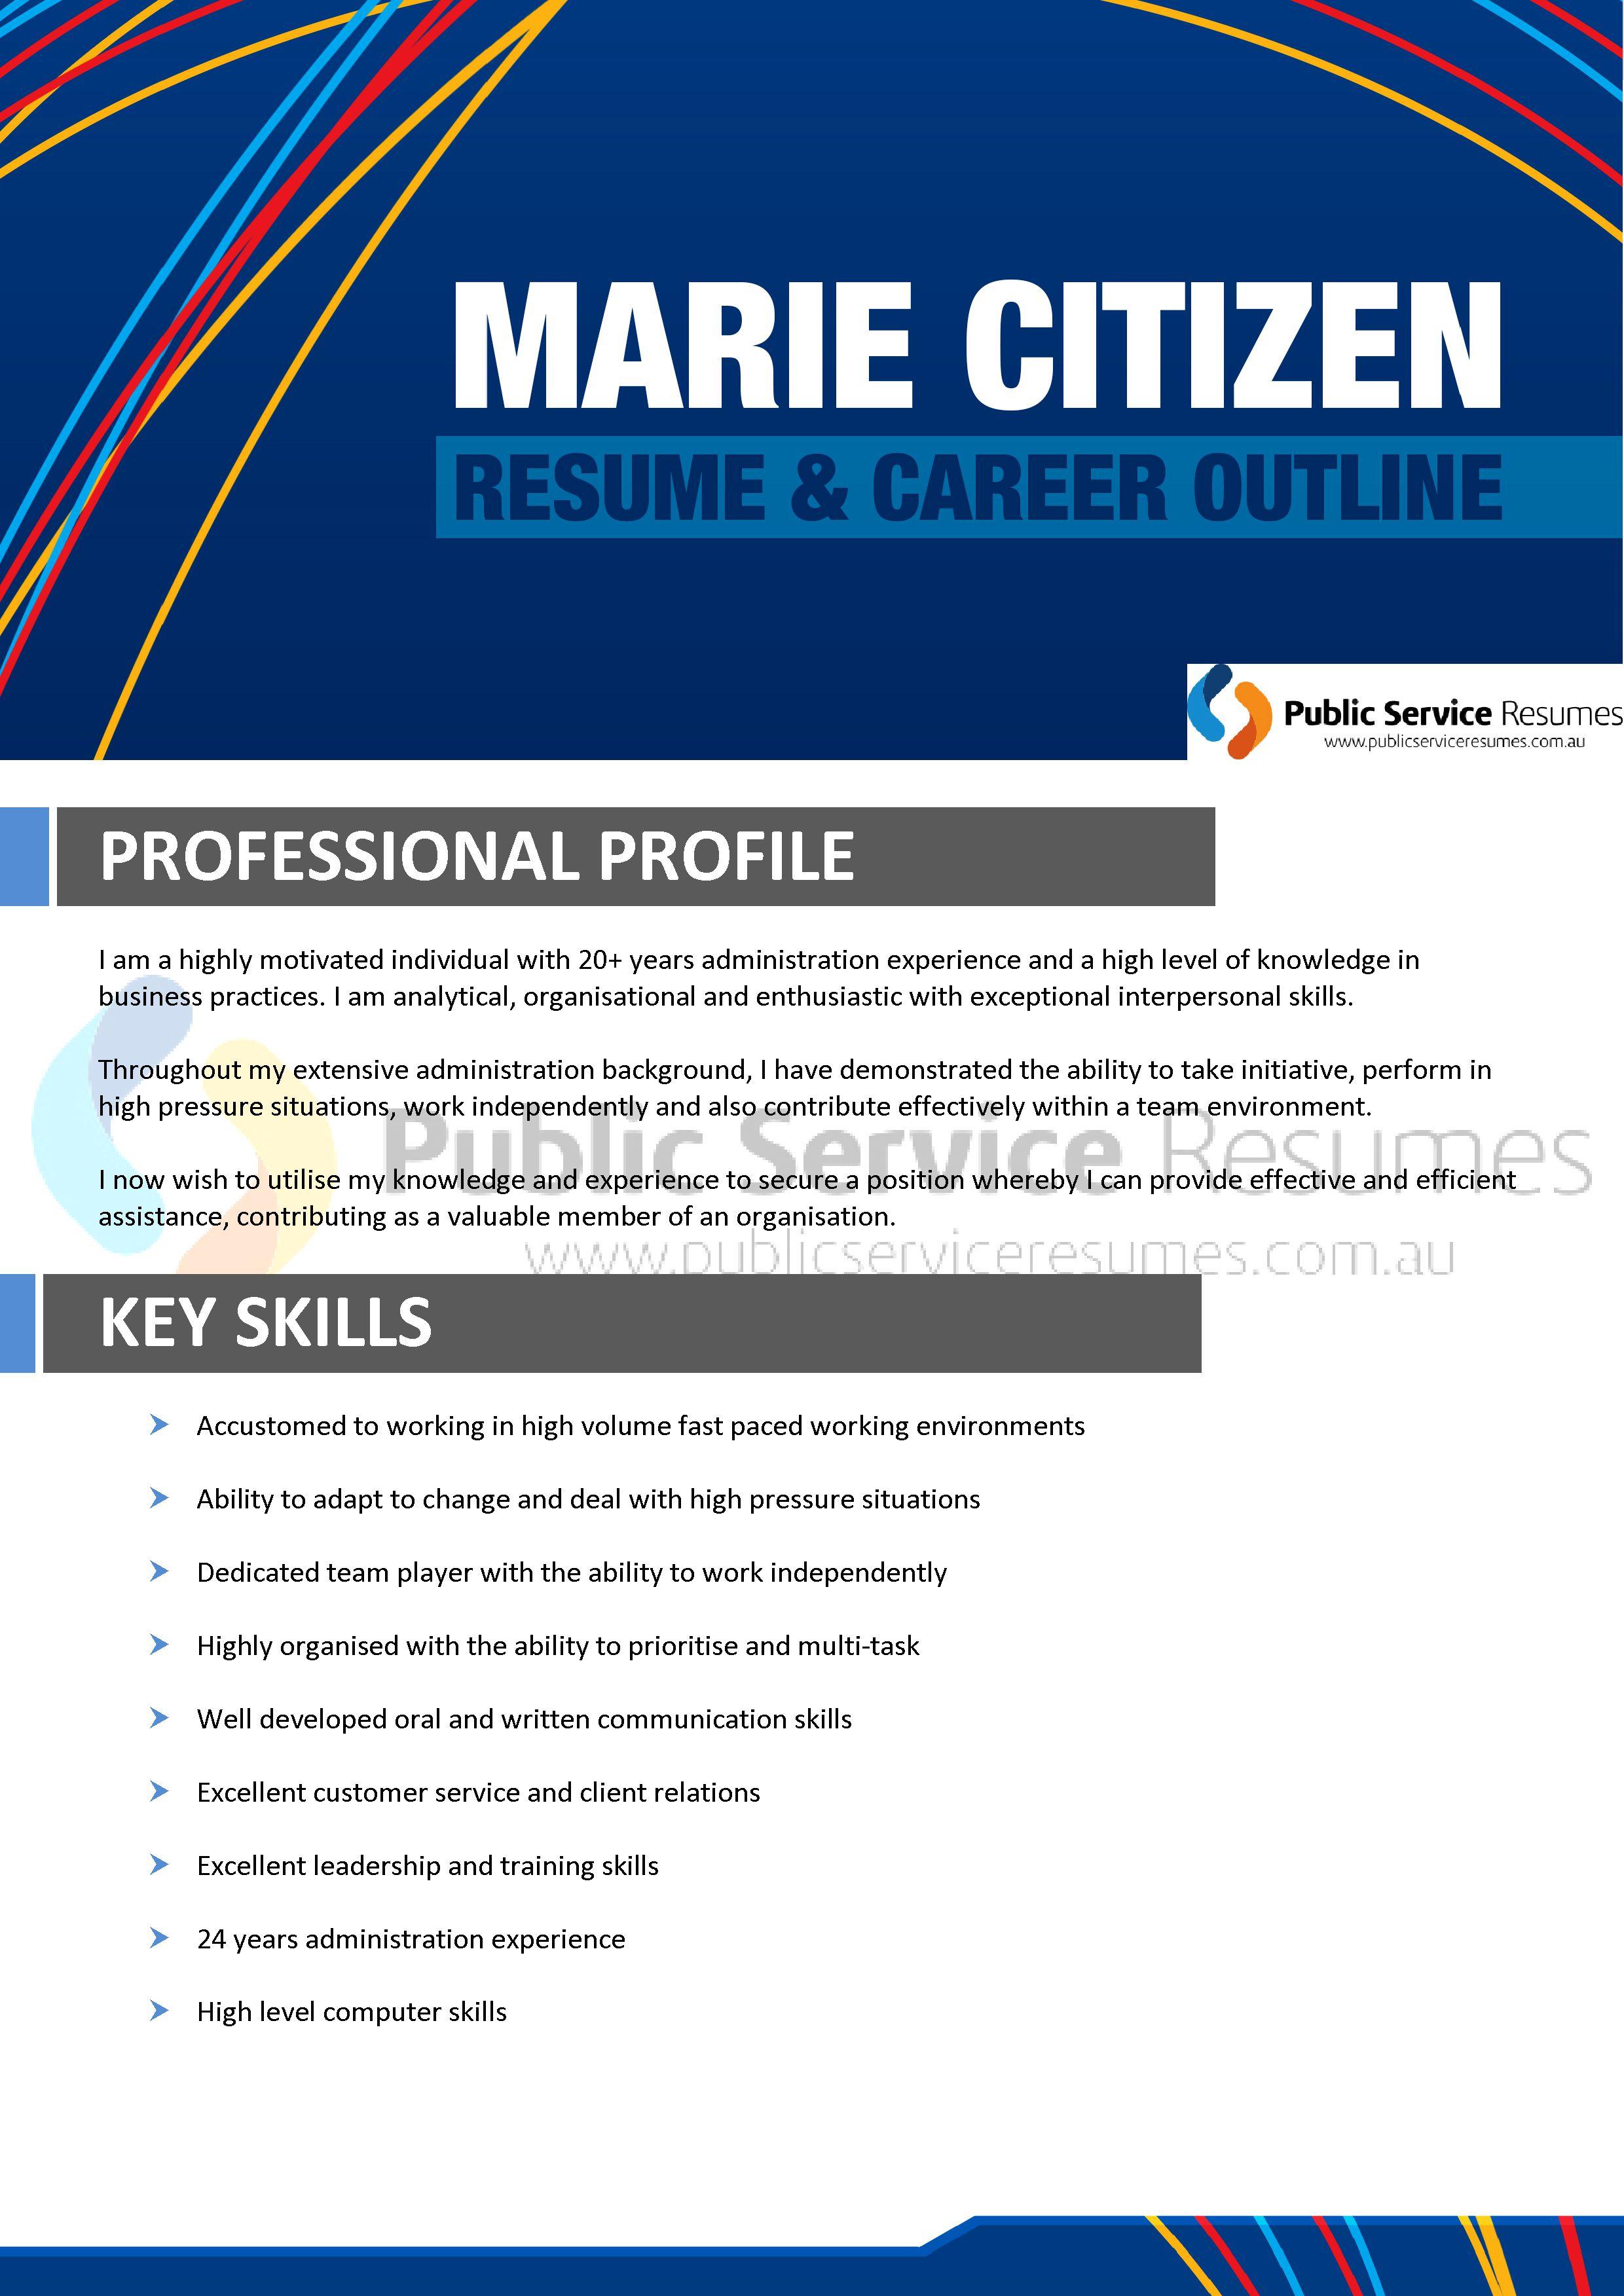 eyecatching resume design 187 public service resumes 187 open